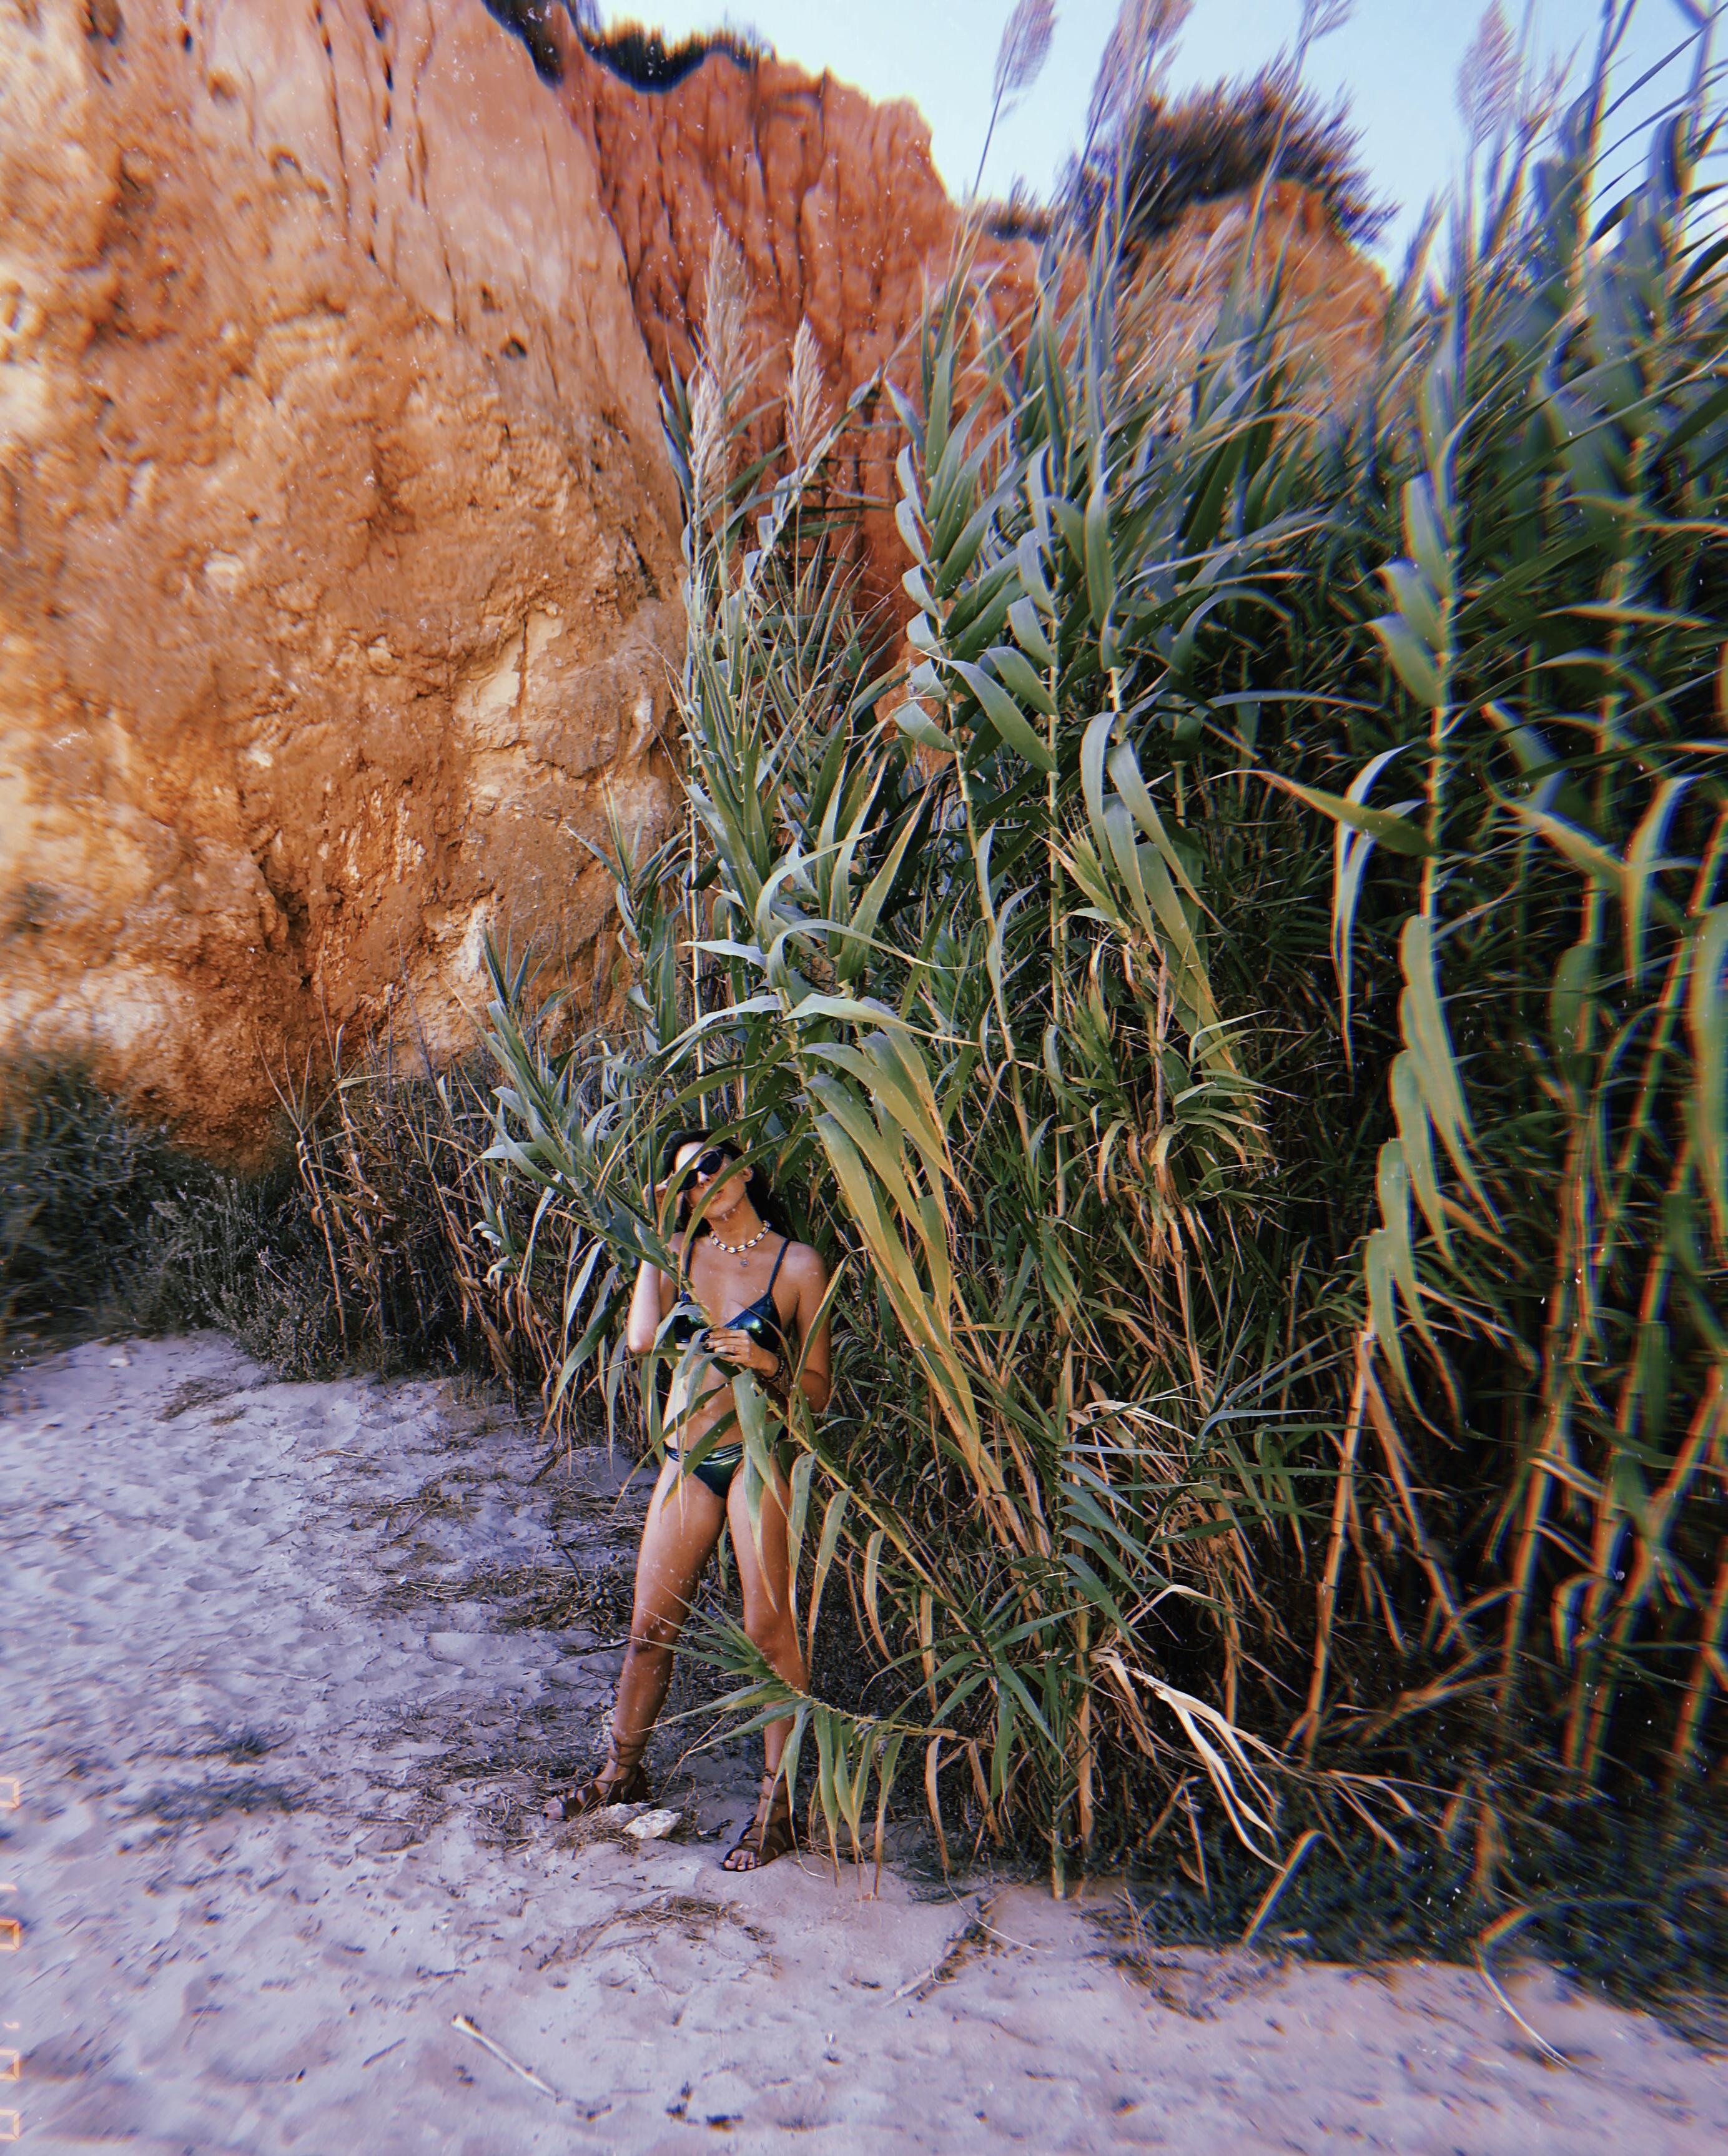 portugalia-algarve-bikini-opalizuj%C4%85